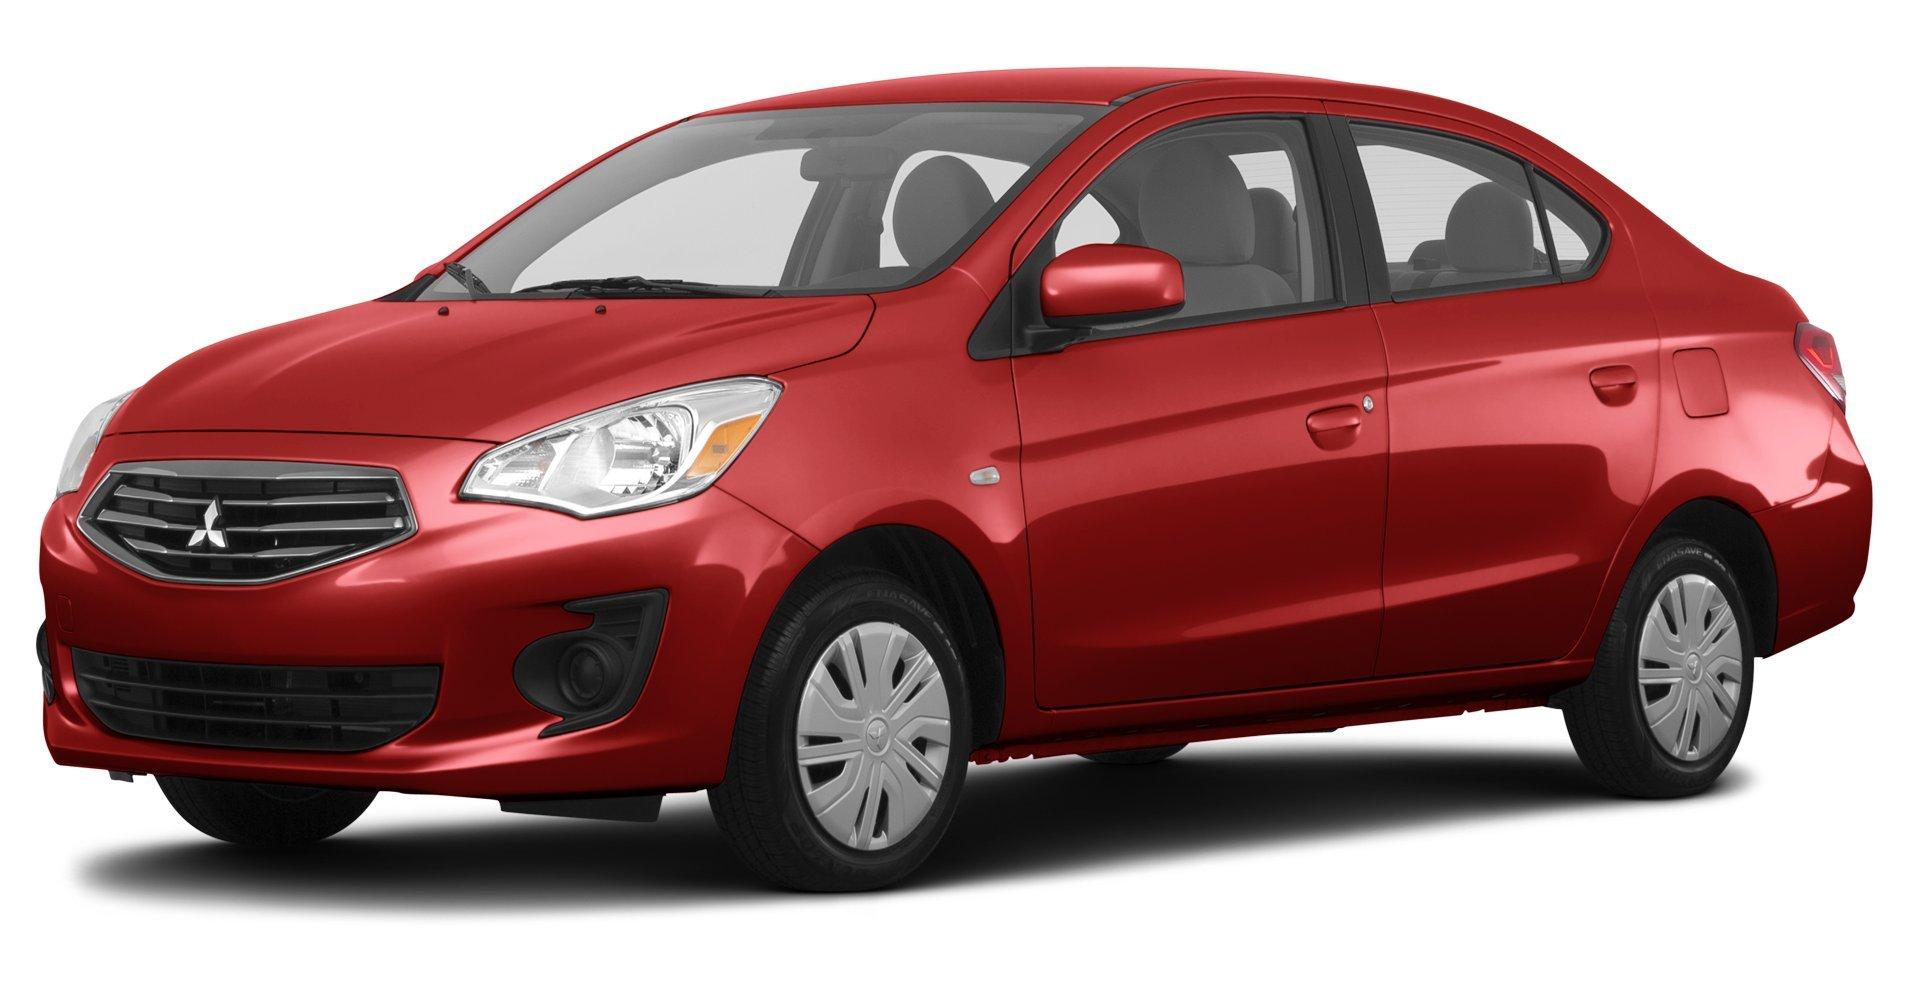 6f327b3f Amazon.com: 2017 Mitsubishi Mirage Reviews, Images, and Specs: Vehicles